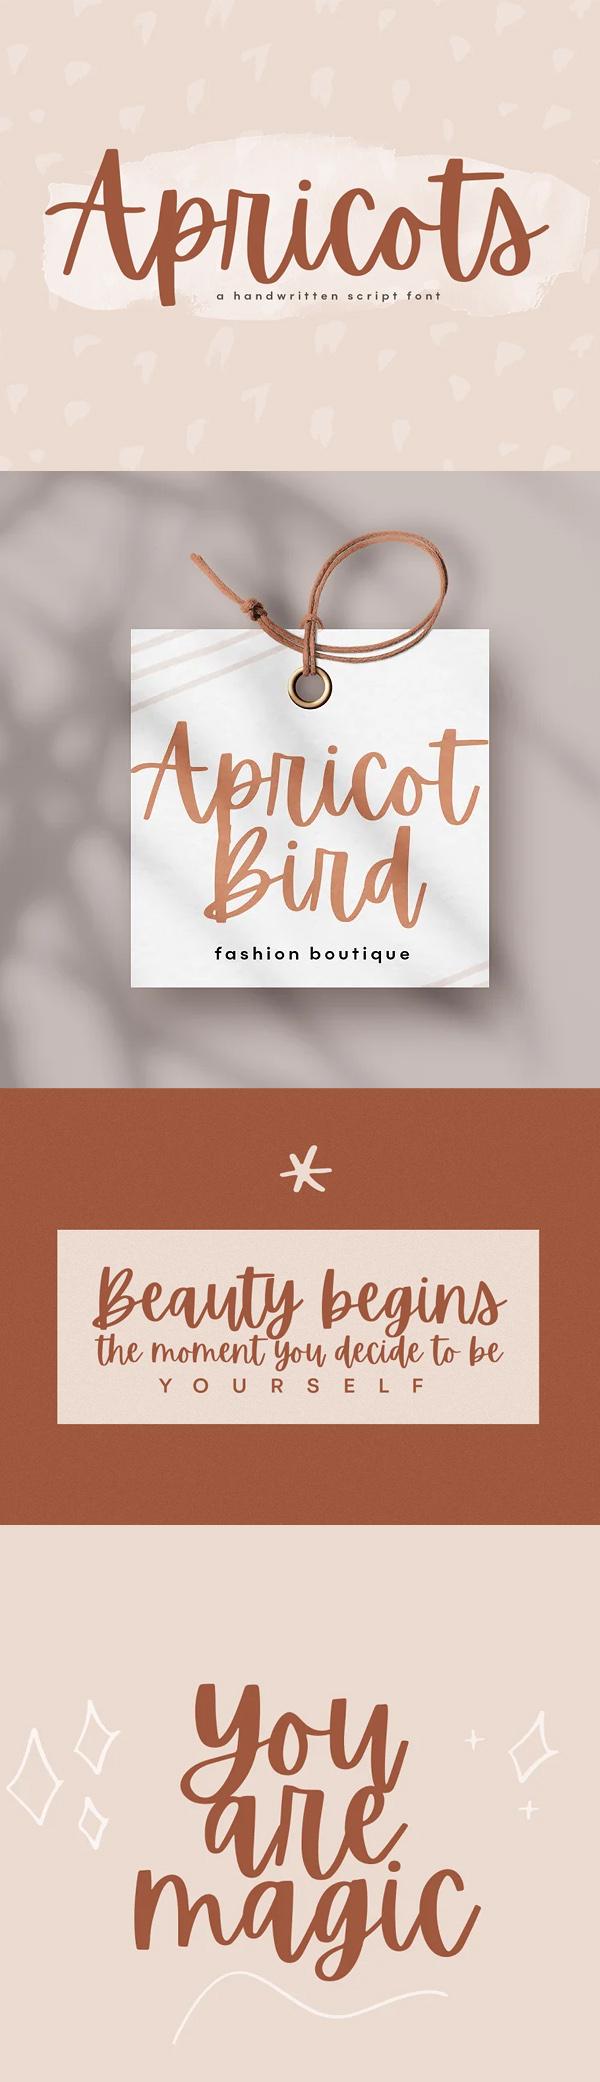 Apricots - A Handwritten Script Font Free Font